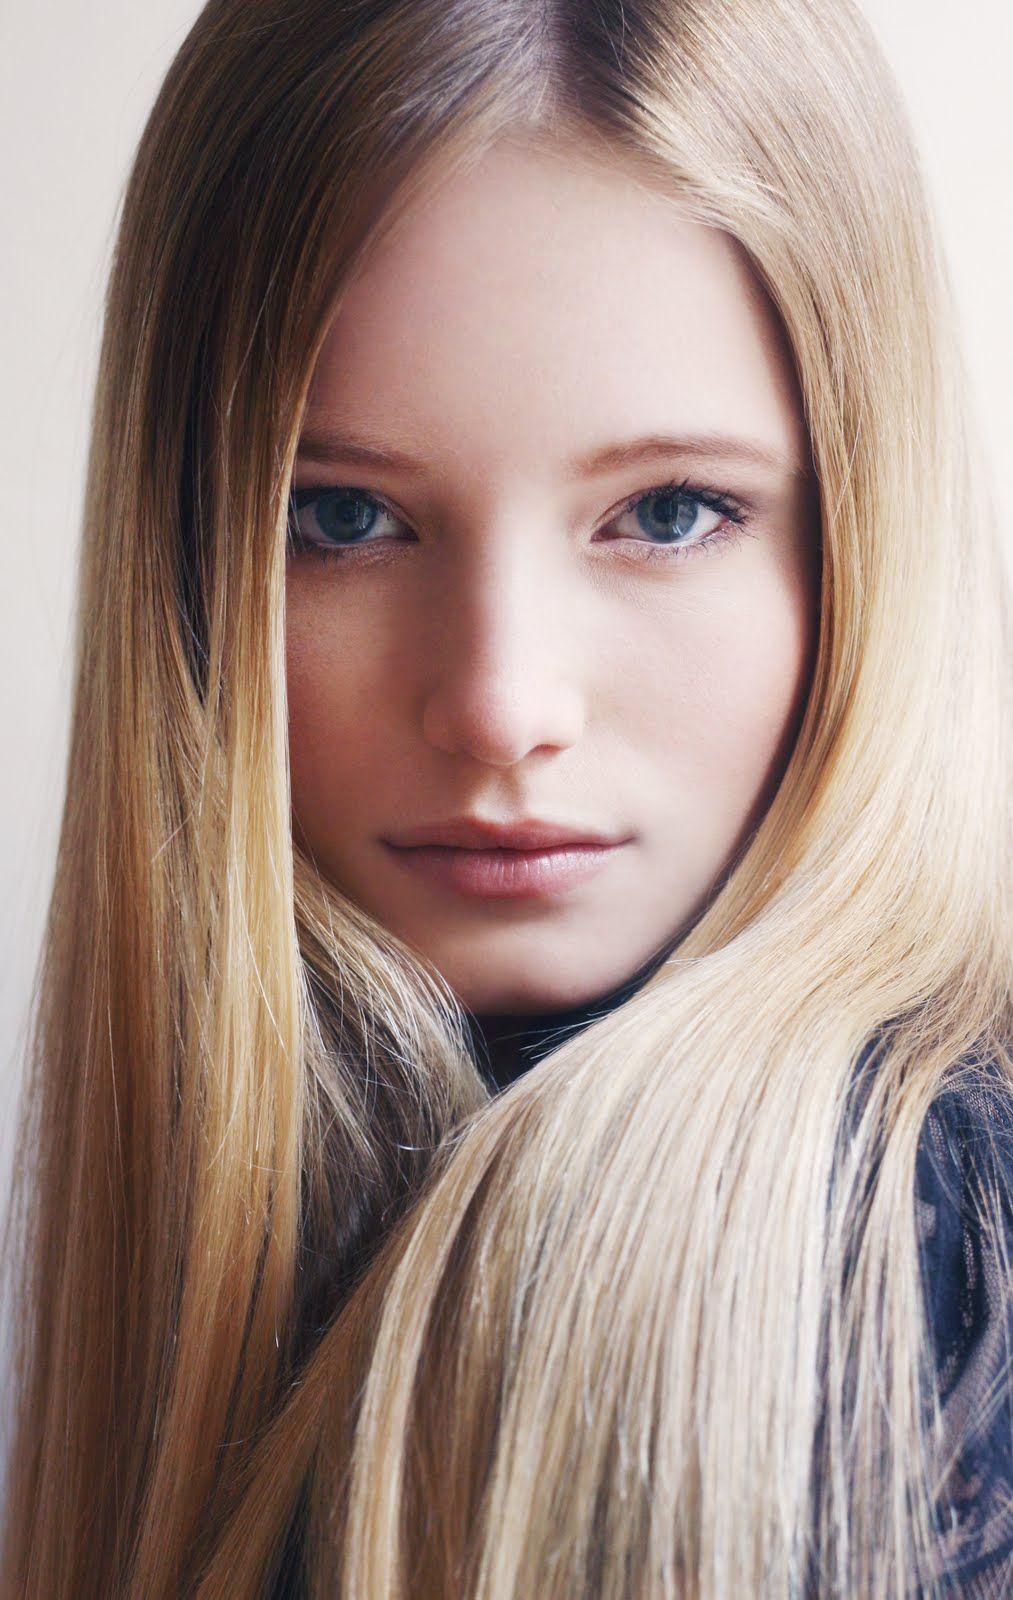 plan te interdite beaut pinterest visages femme blonde et beaux enfants. Black Bedroom Furniture Sets. Home Design Ideas